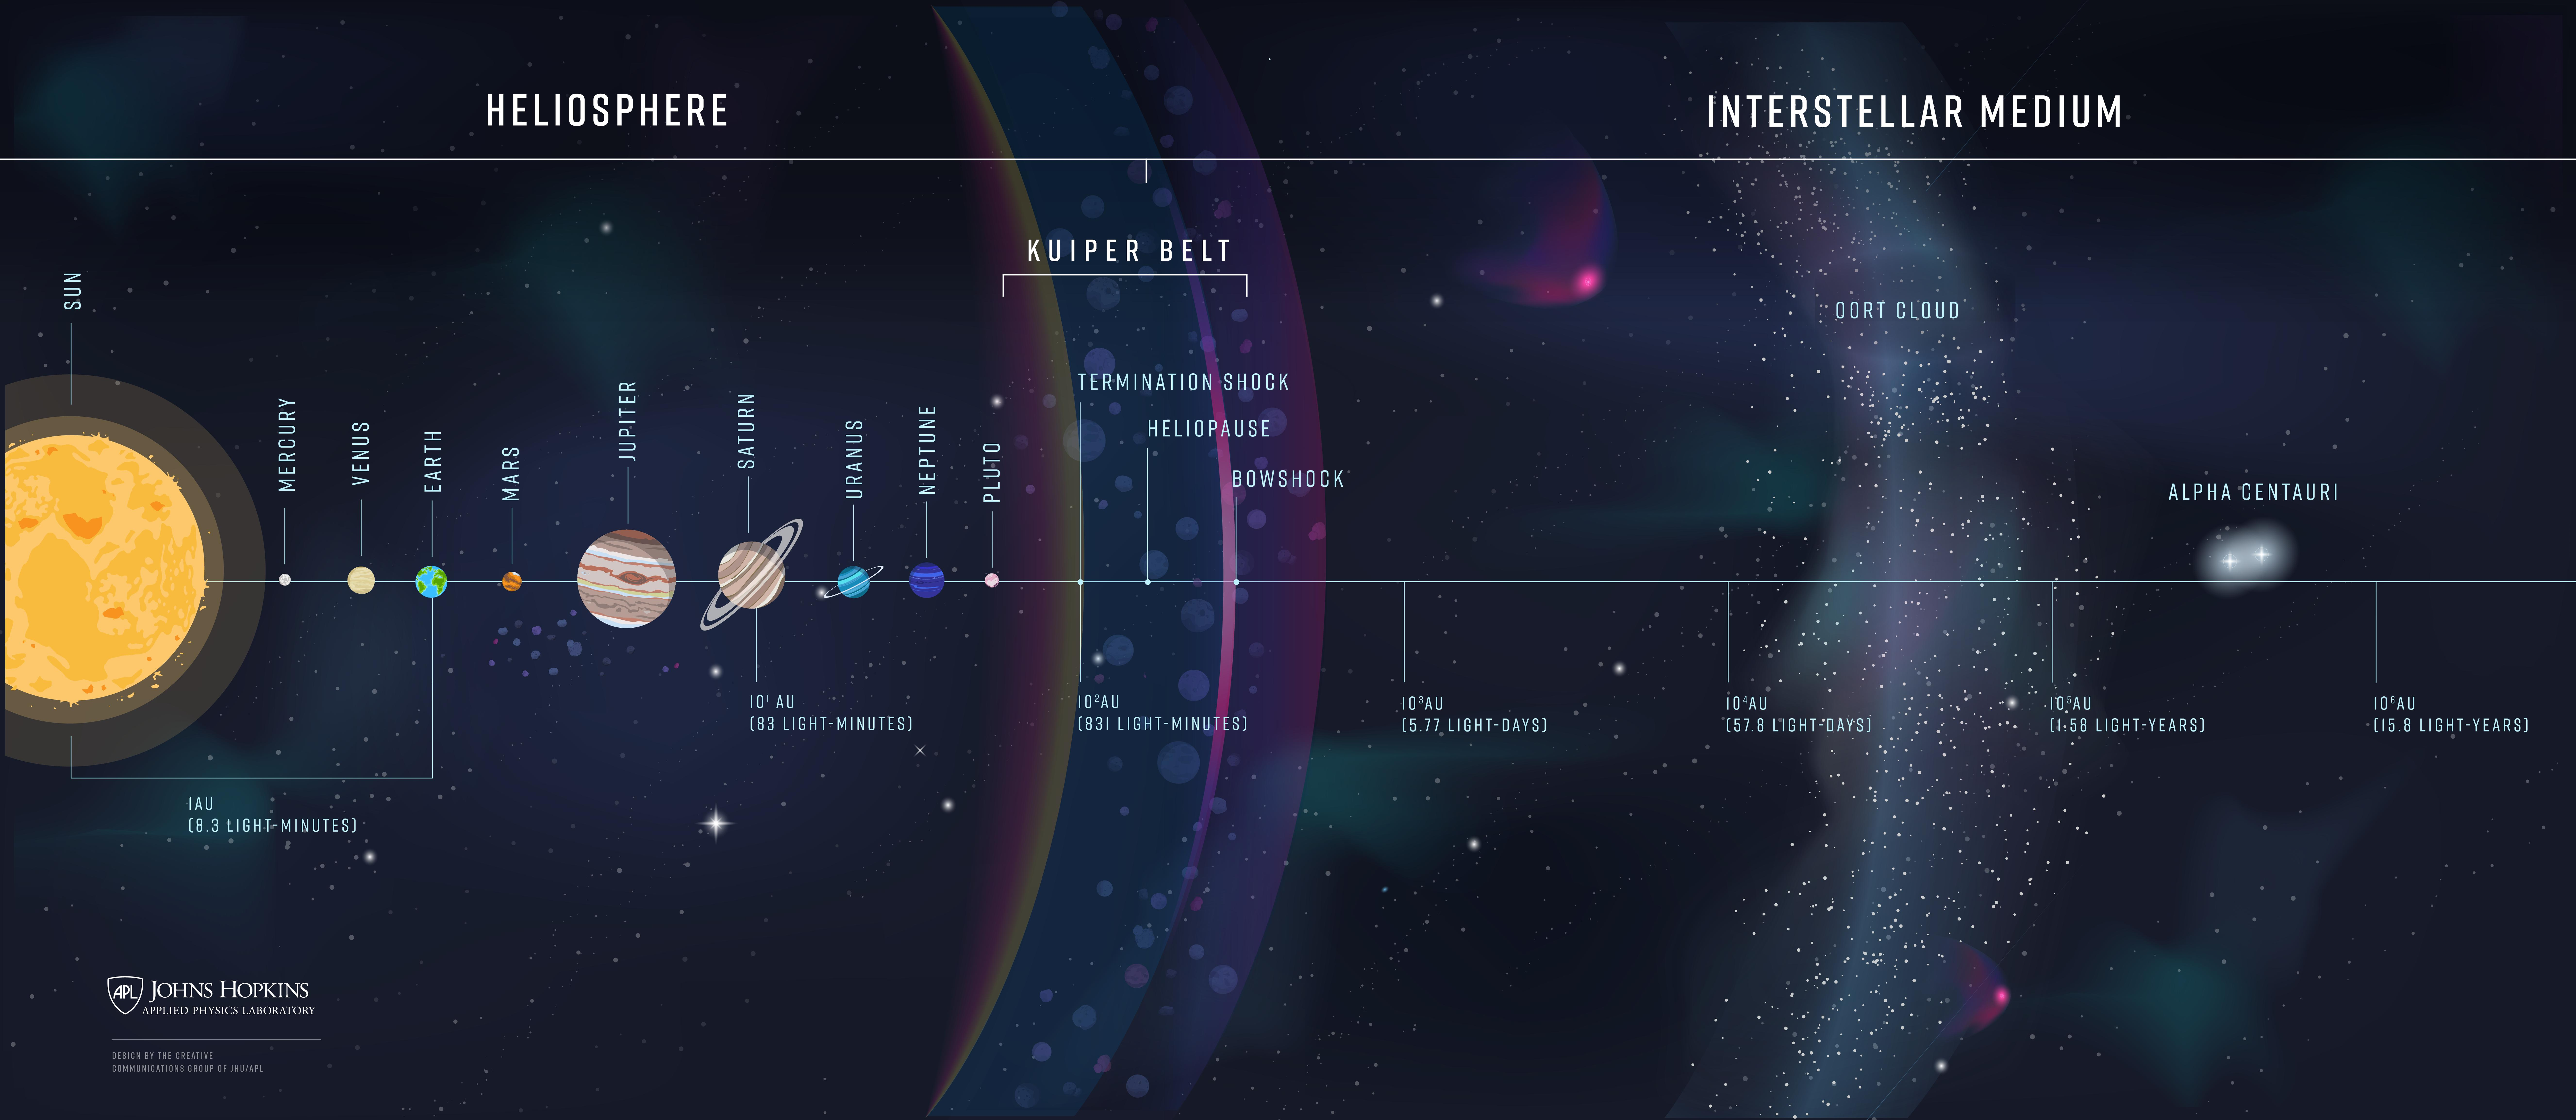 The Heliosphere and interstellar medium. Image via Johns Hopkins APL.